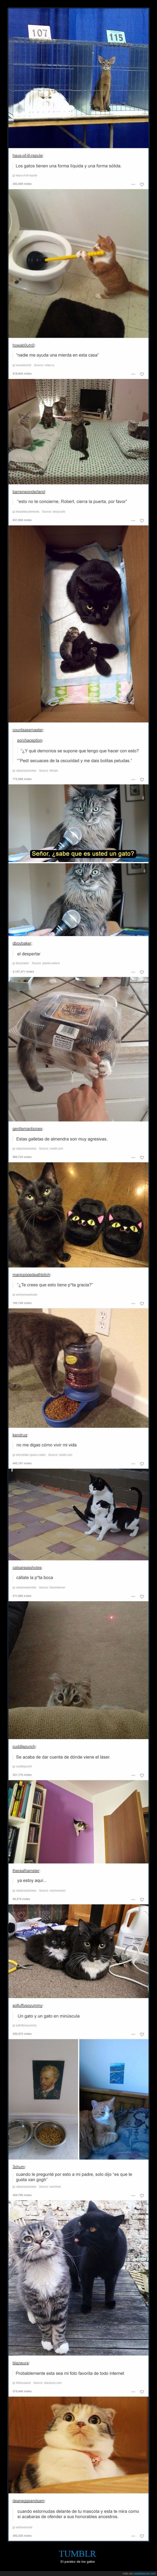 fotos divertidas,gatos,tumblr